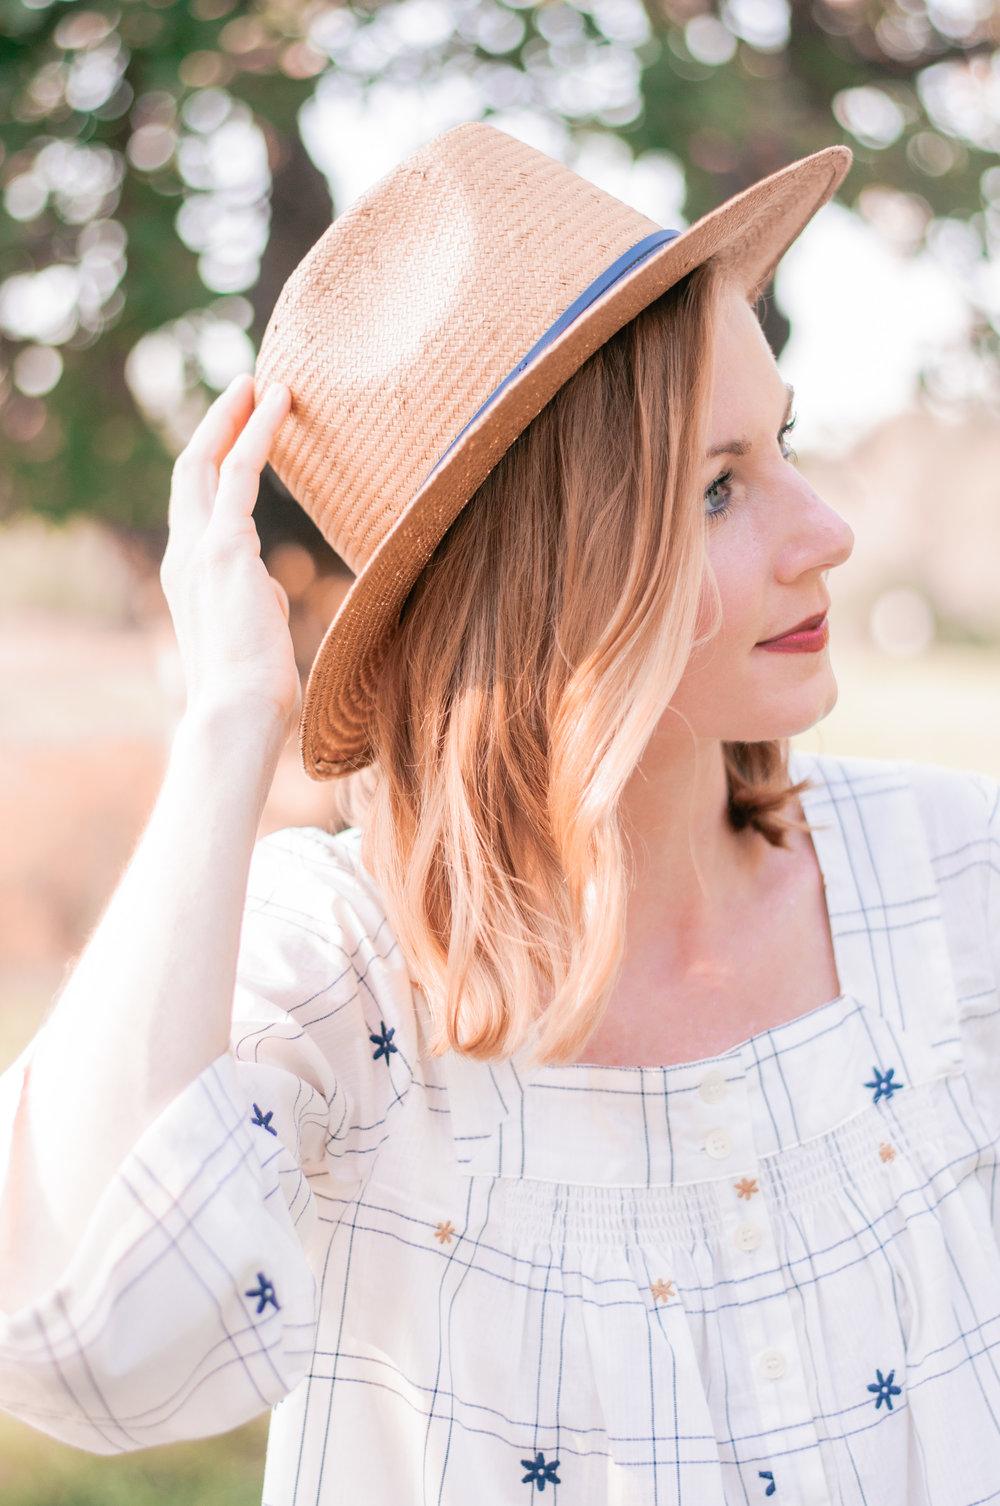 Brixton Straw Wide Brimmed Fedora Hat for Women